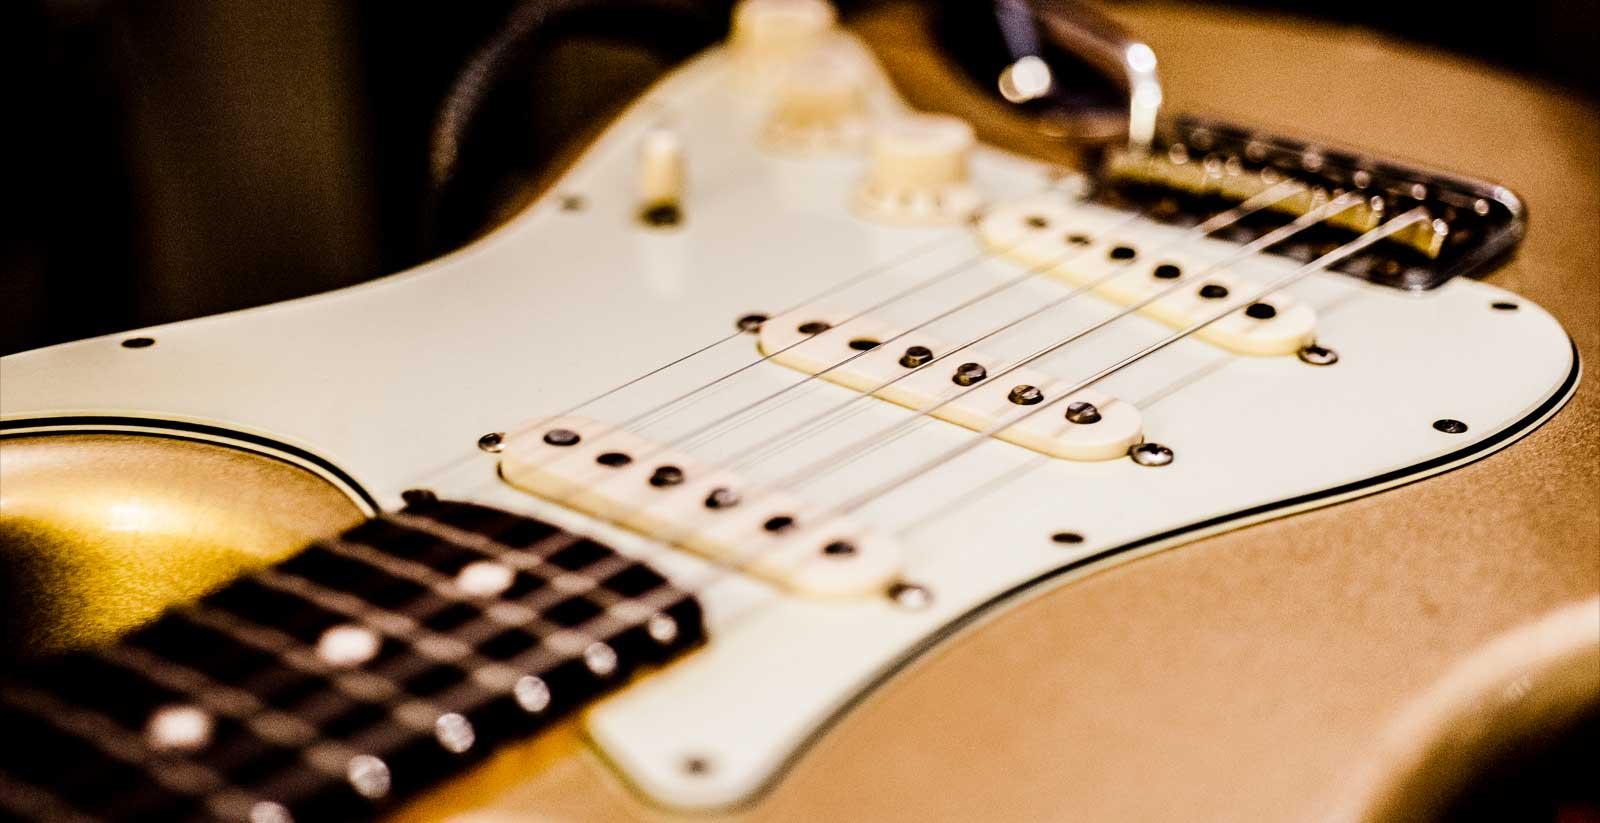 Golden Stratocaster - The Guitar School